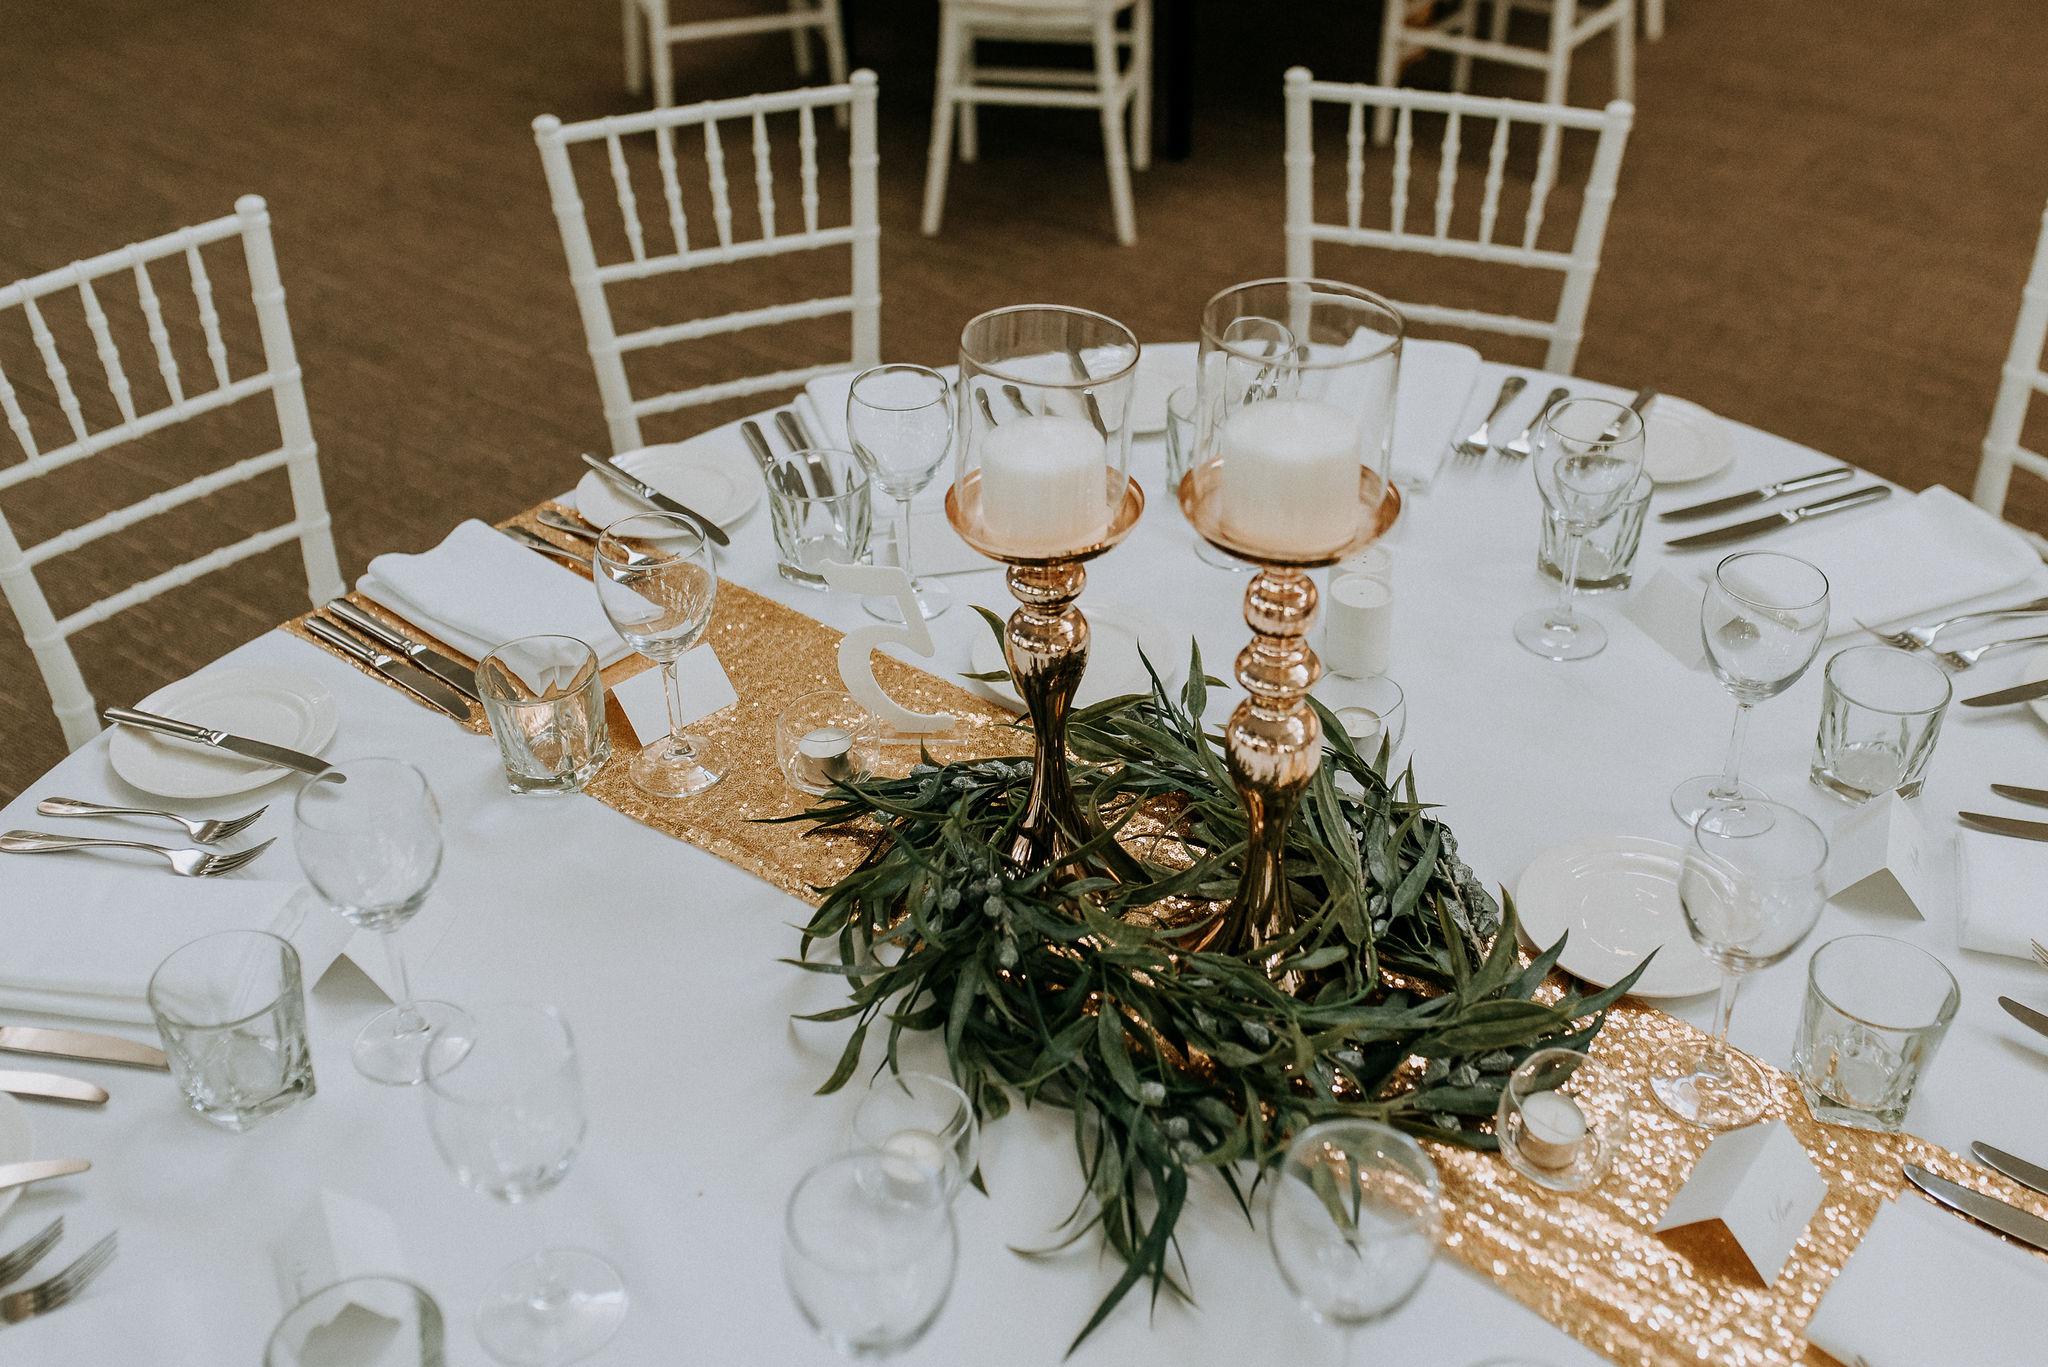 CAVES-BEACH-HOTEL-WEDDING-PATTEN-163.jpg